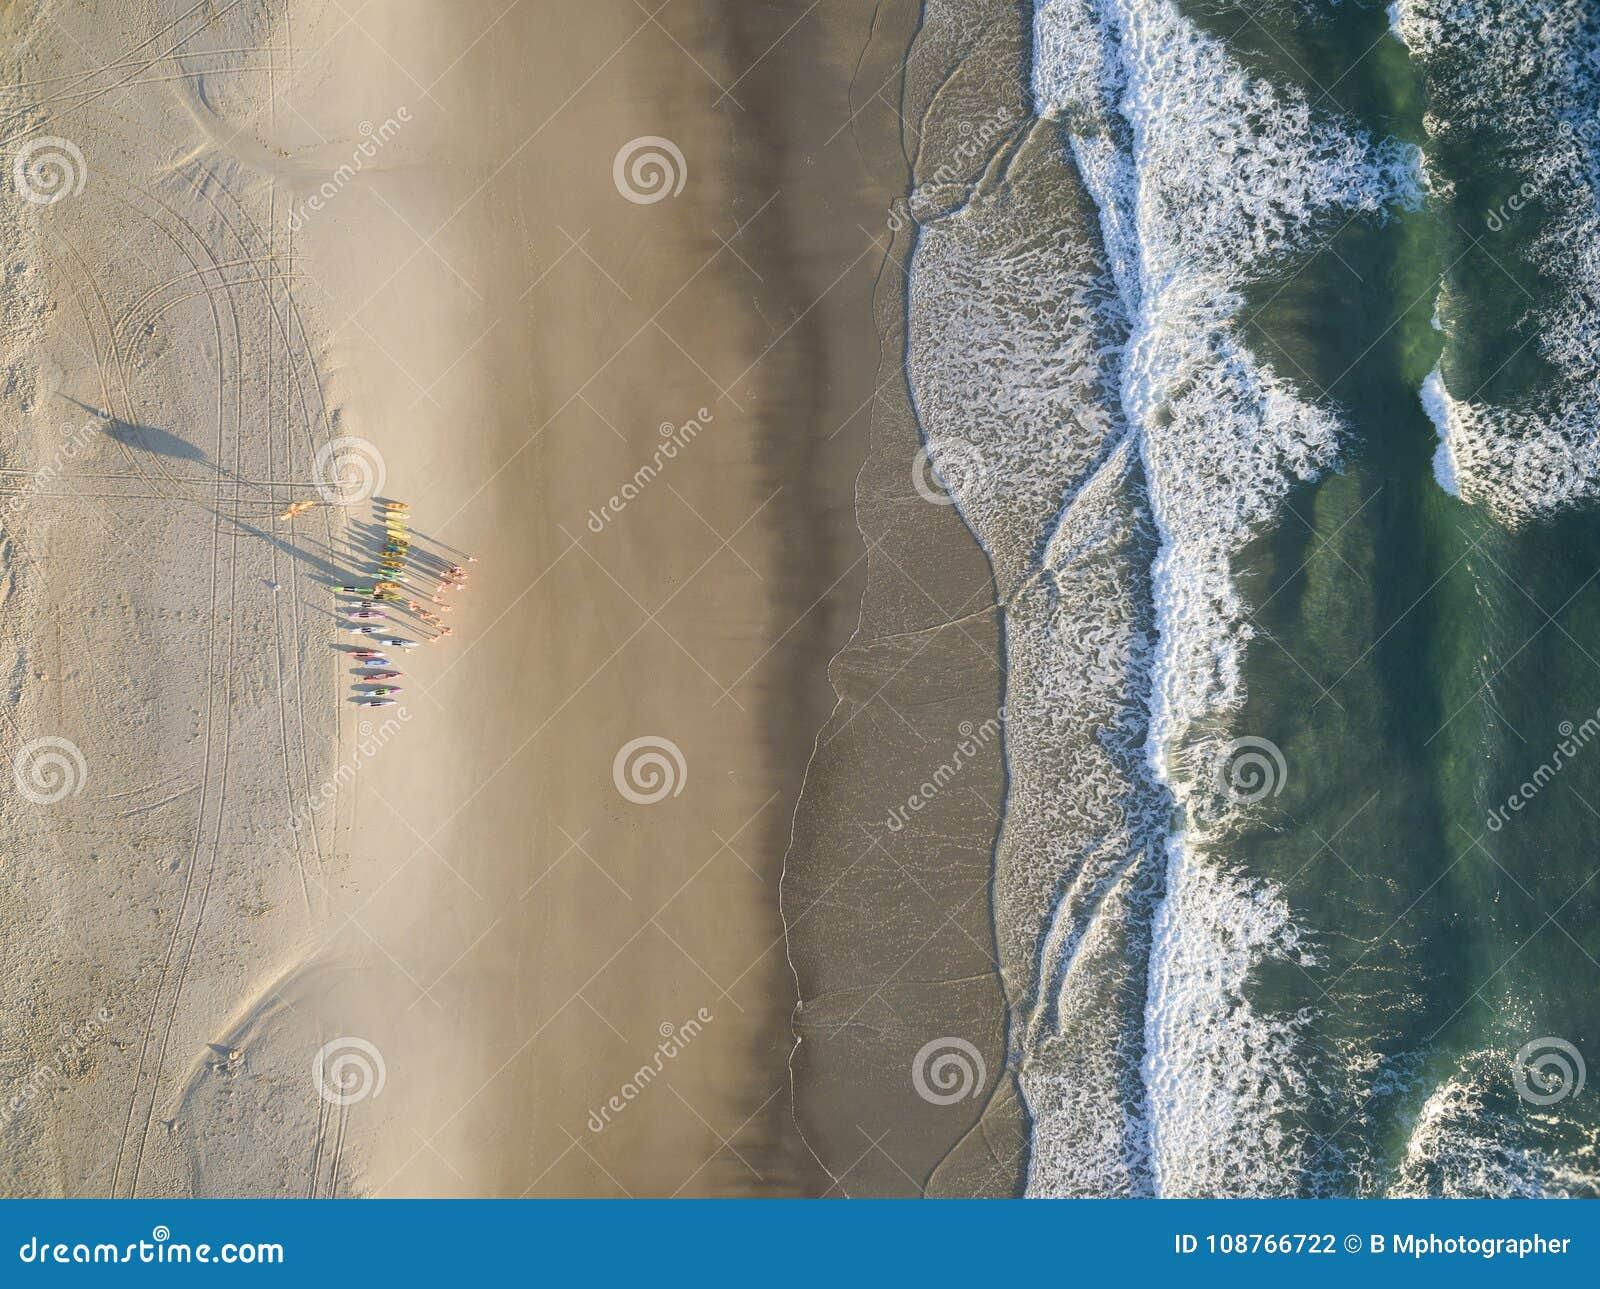 miami beach on the gold coast, queensland, australia. stock